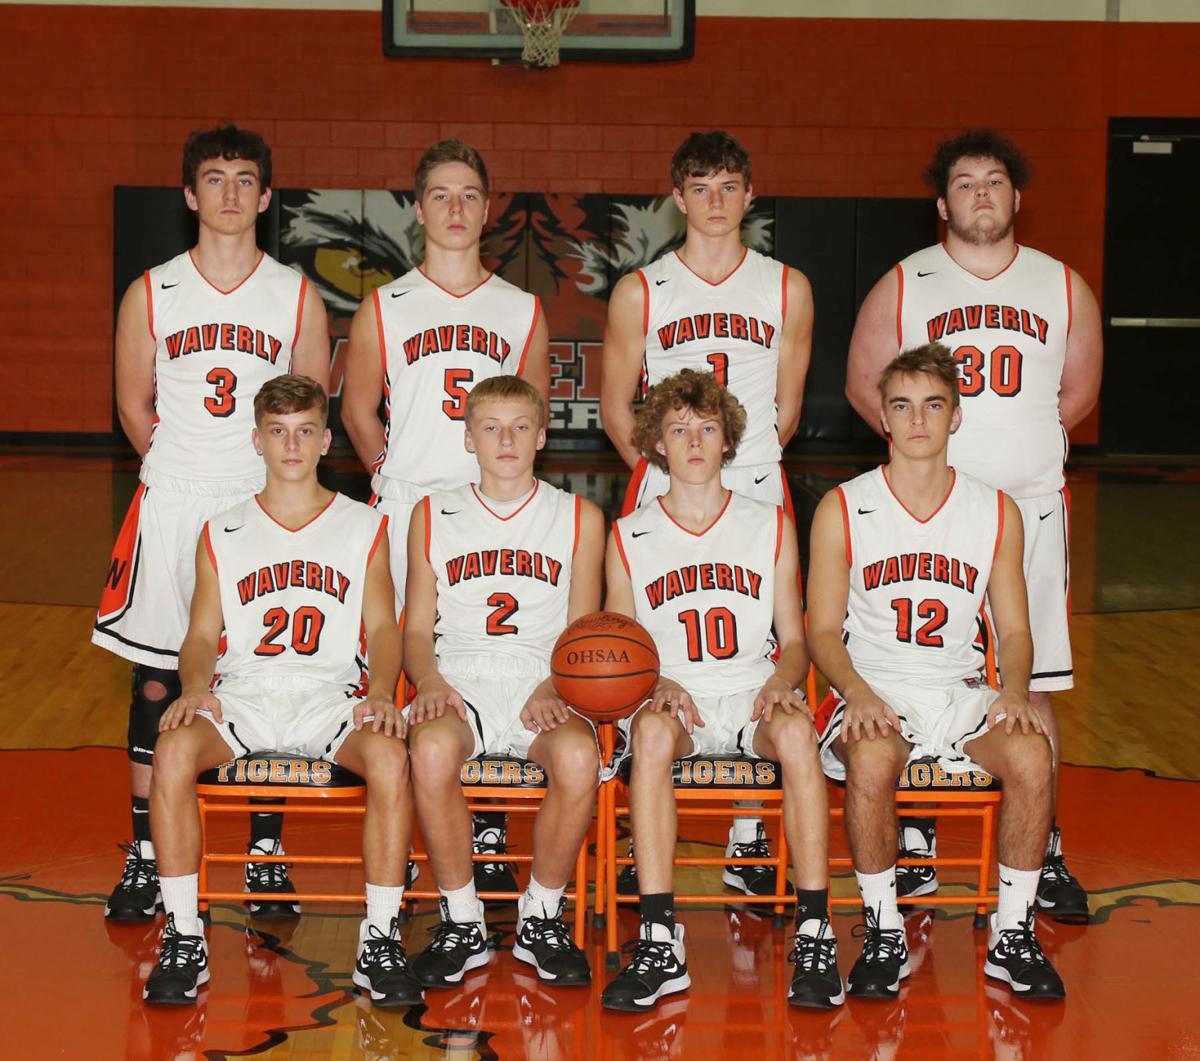 Waverly JV boys basketball team